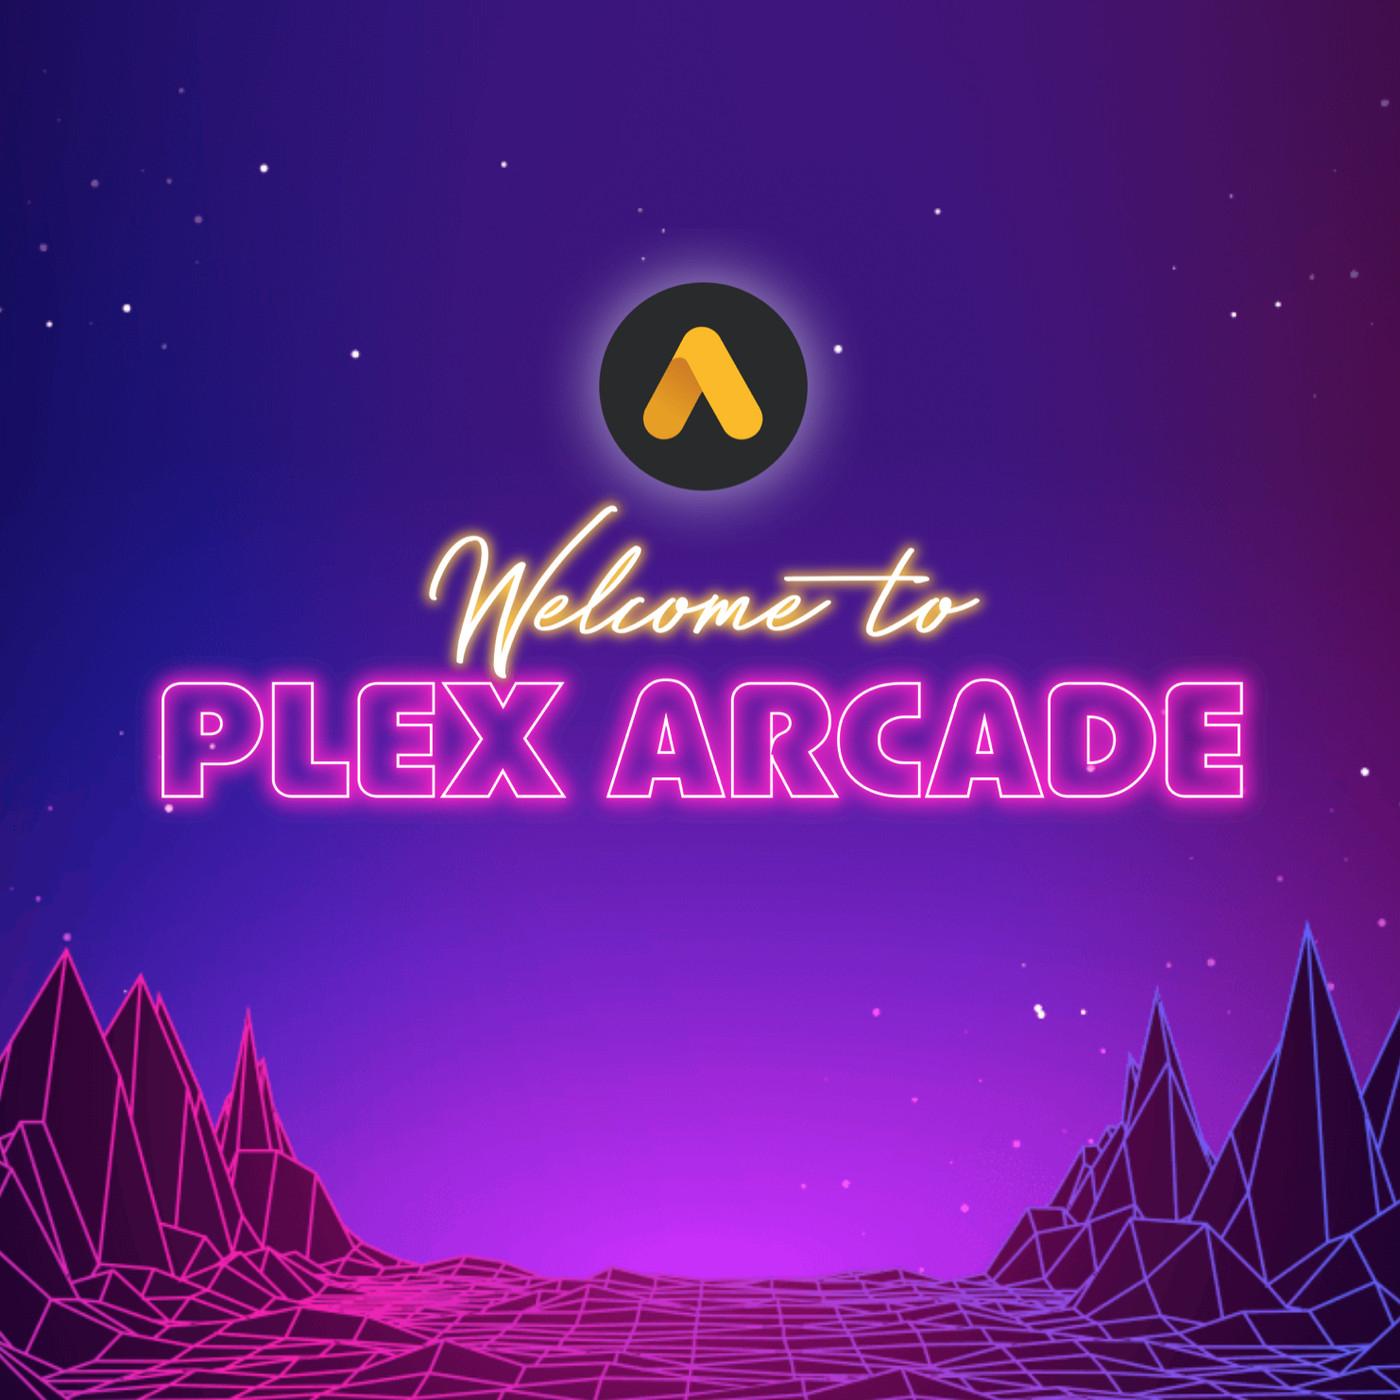 1 Month Free Plex Pass + 7 Days Plex Arcade Free Trial / £2.29 pm thereafter (using code) @ Plex